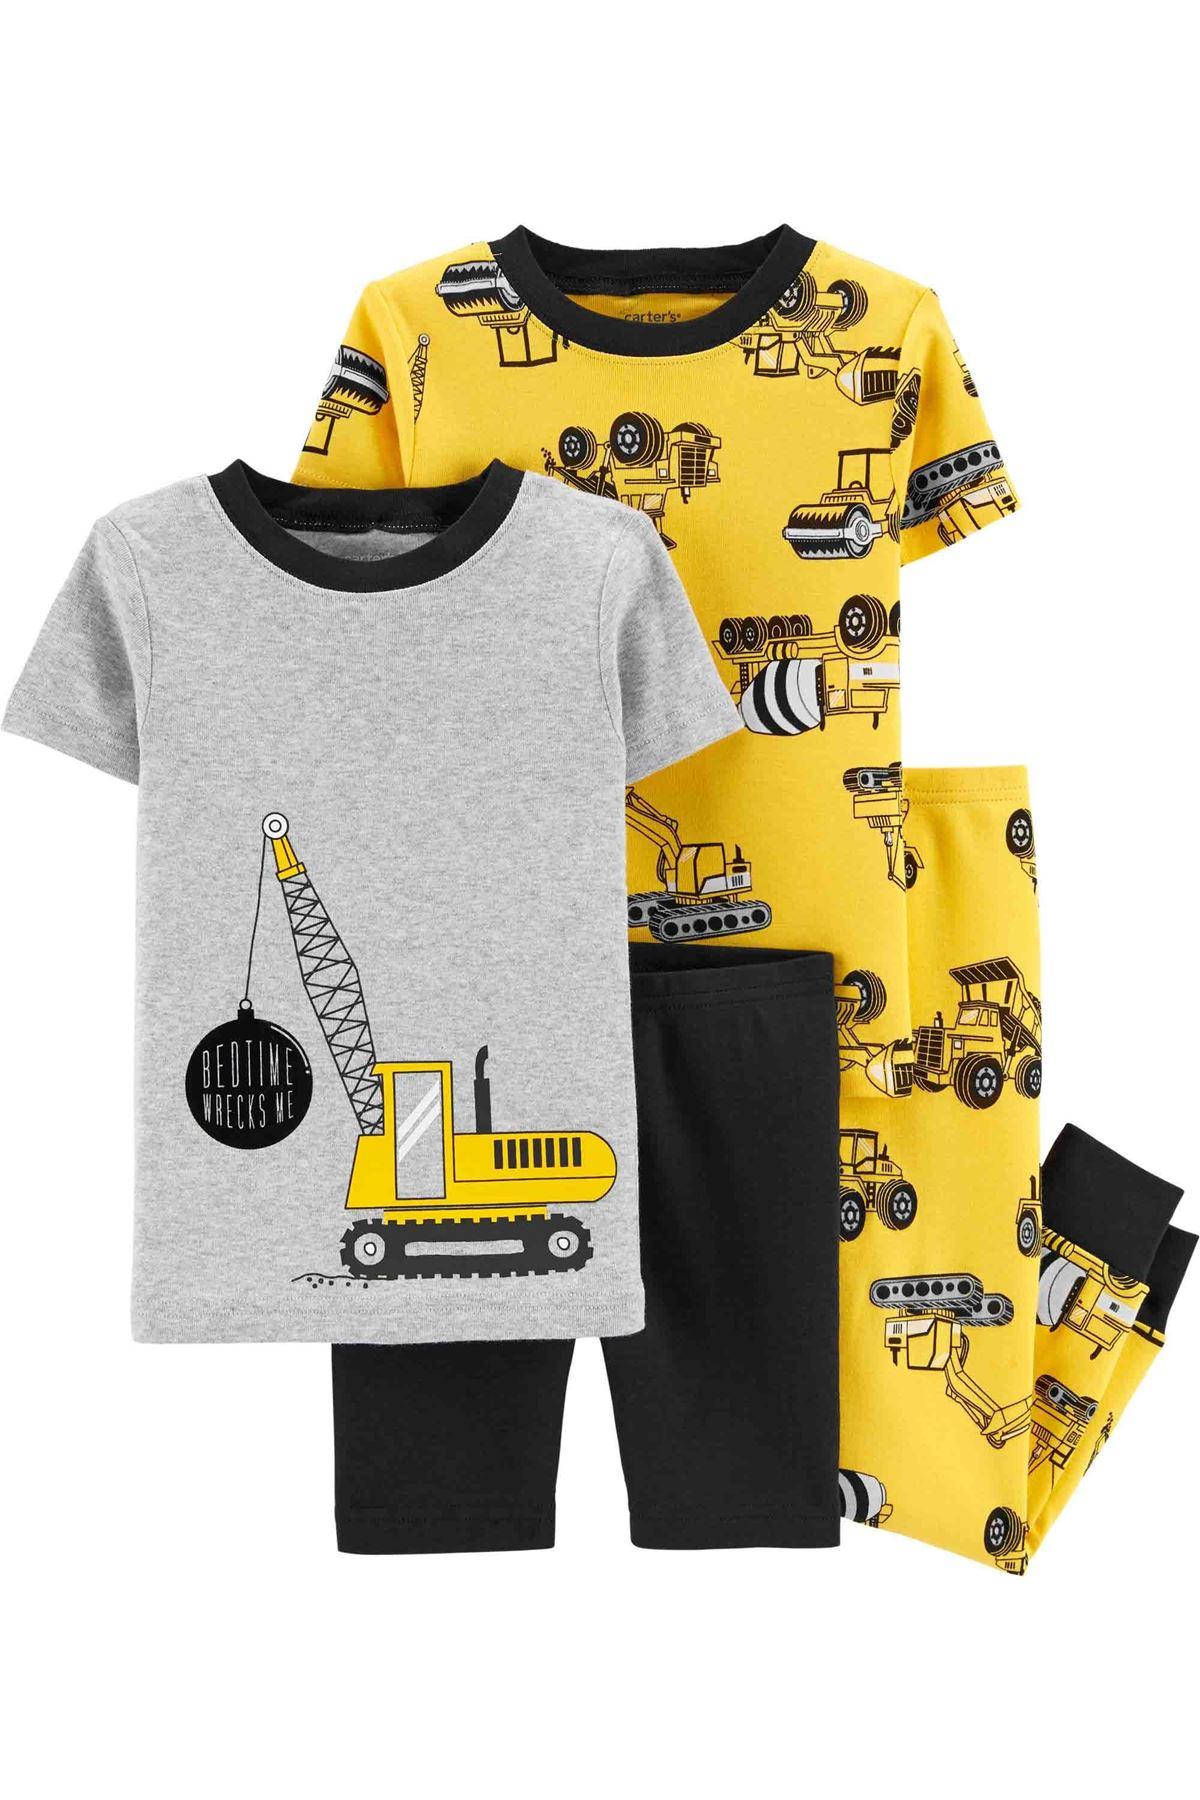 Carter's Erkek Bebek 4'lü Pijama Takım 1H450910 Print